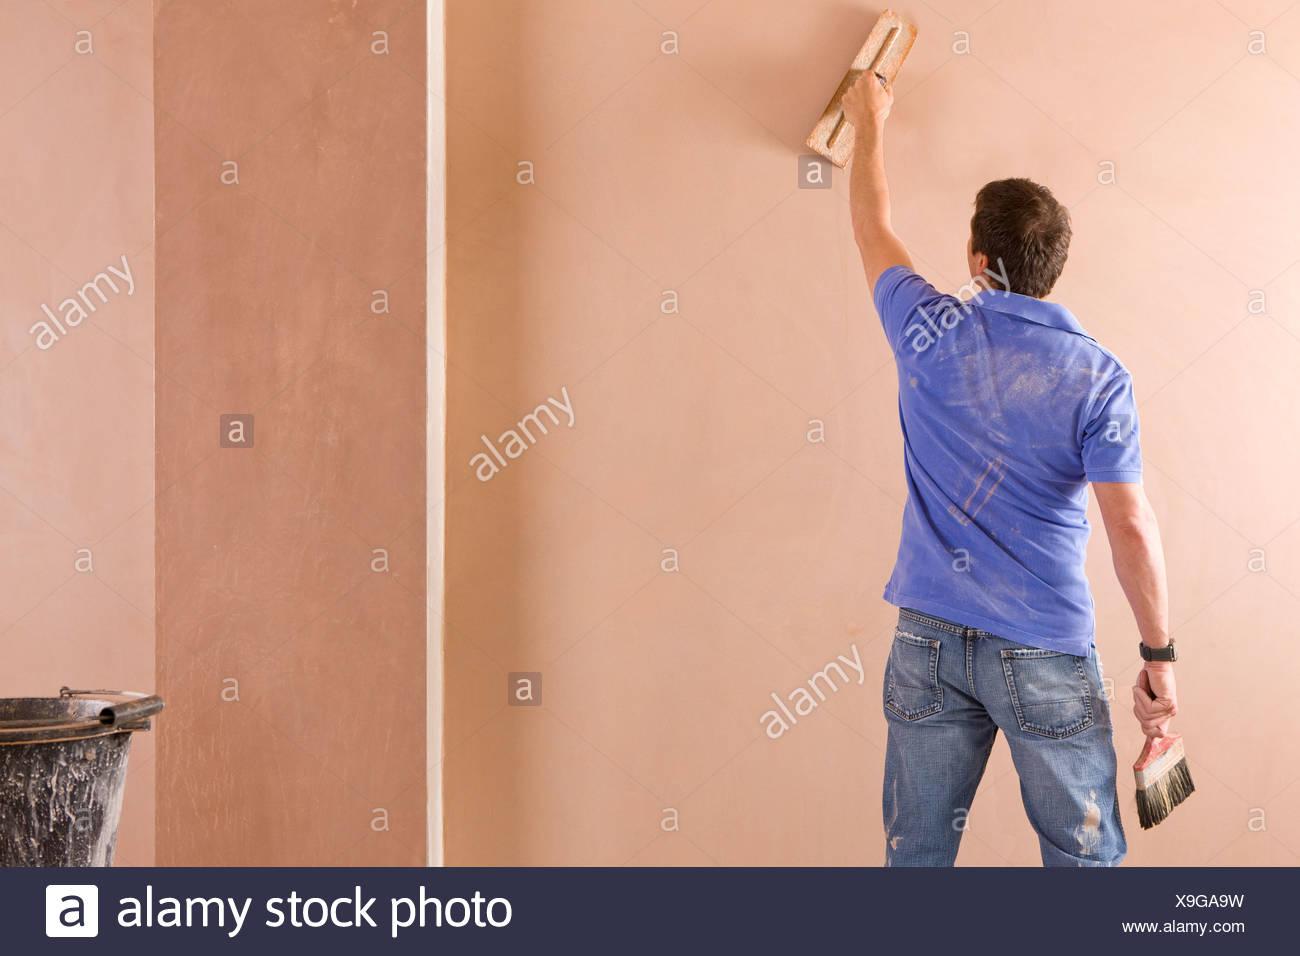 Man Verputzen Wand im Haus Stockfoto, Bild: 281257141 - Alamy